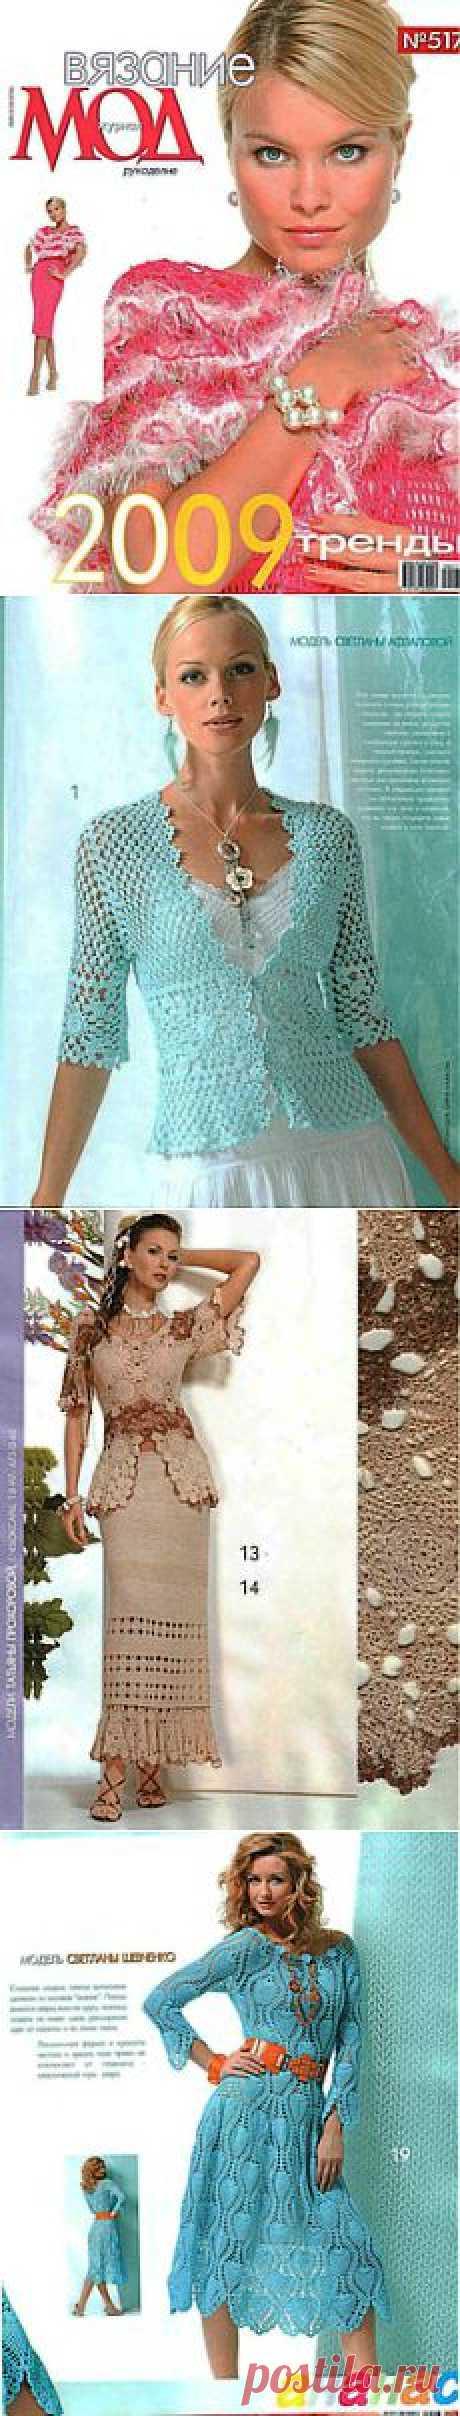 Журнал Мод №517 2009